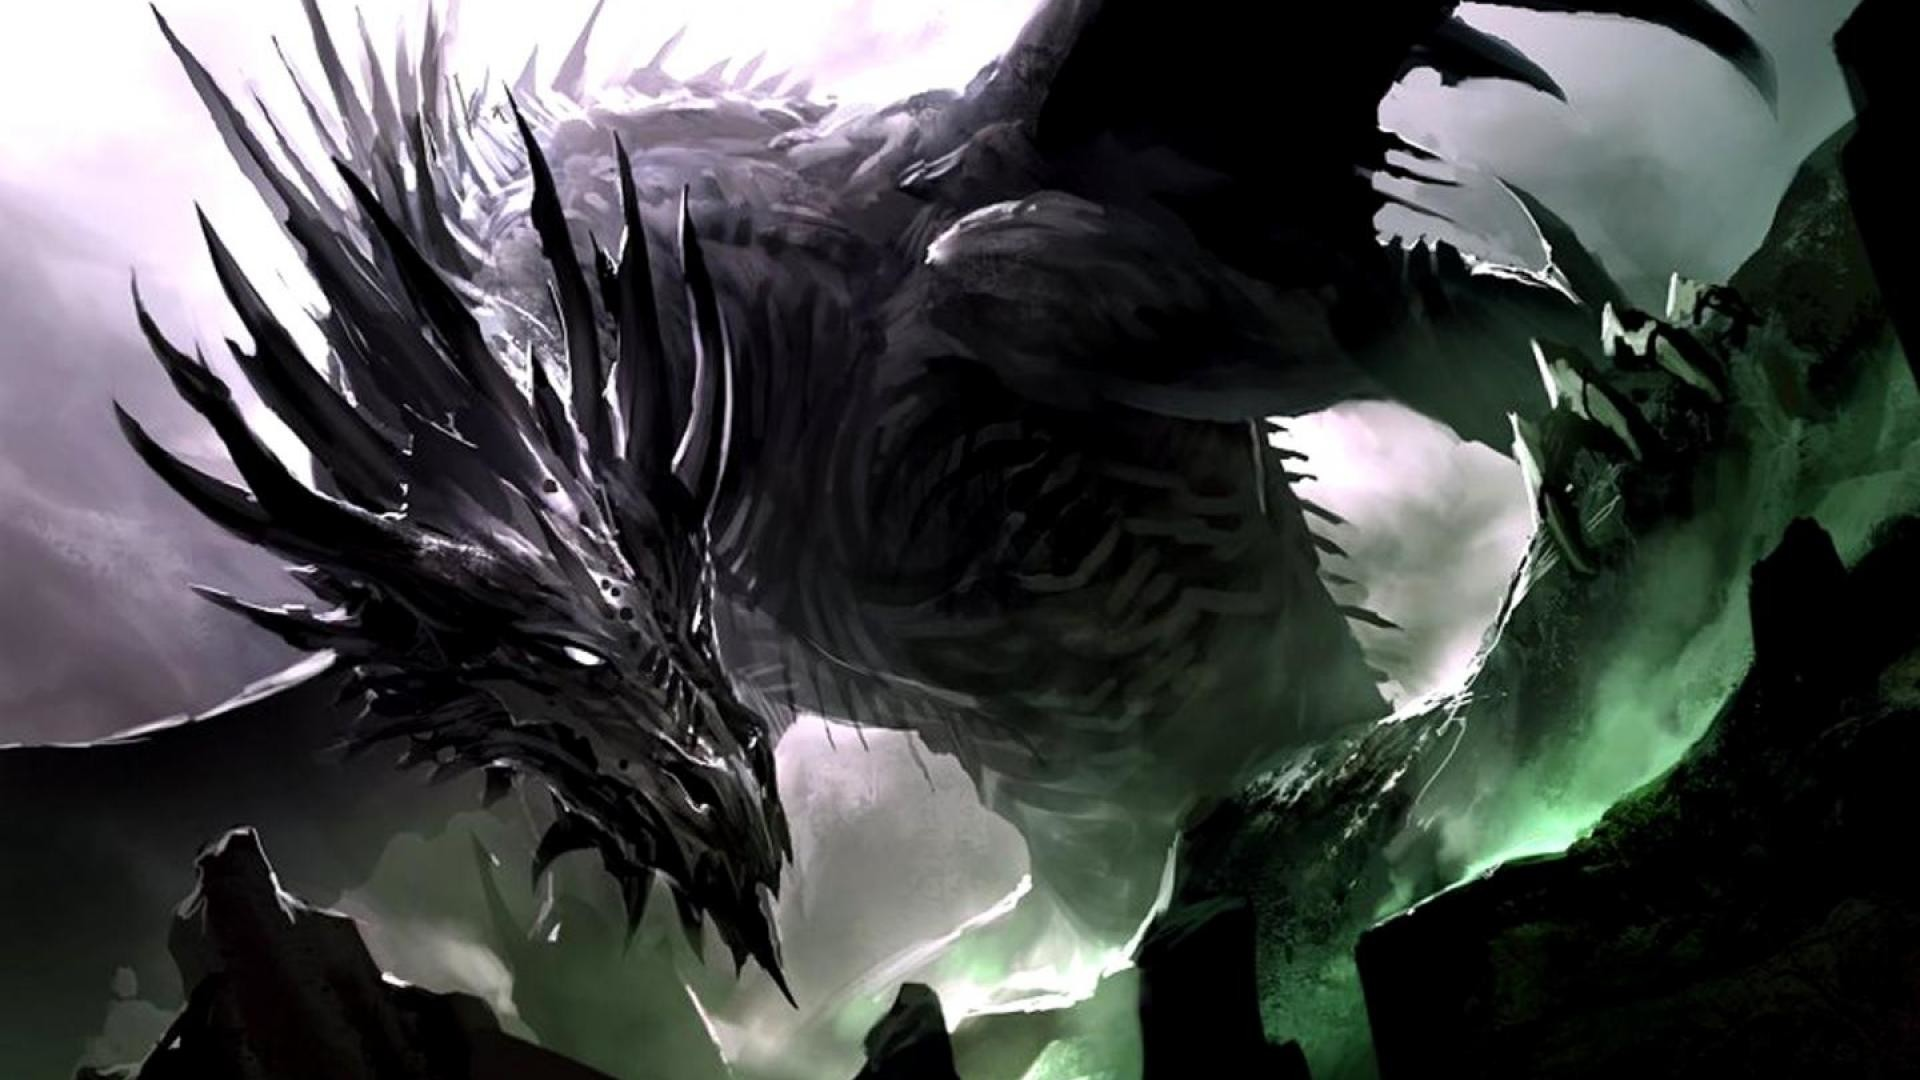 Black Dragon Wallpaper HD 7 hd background hd screensavers hd wallpaper .